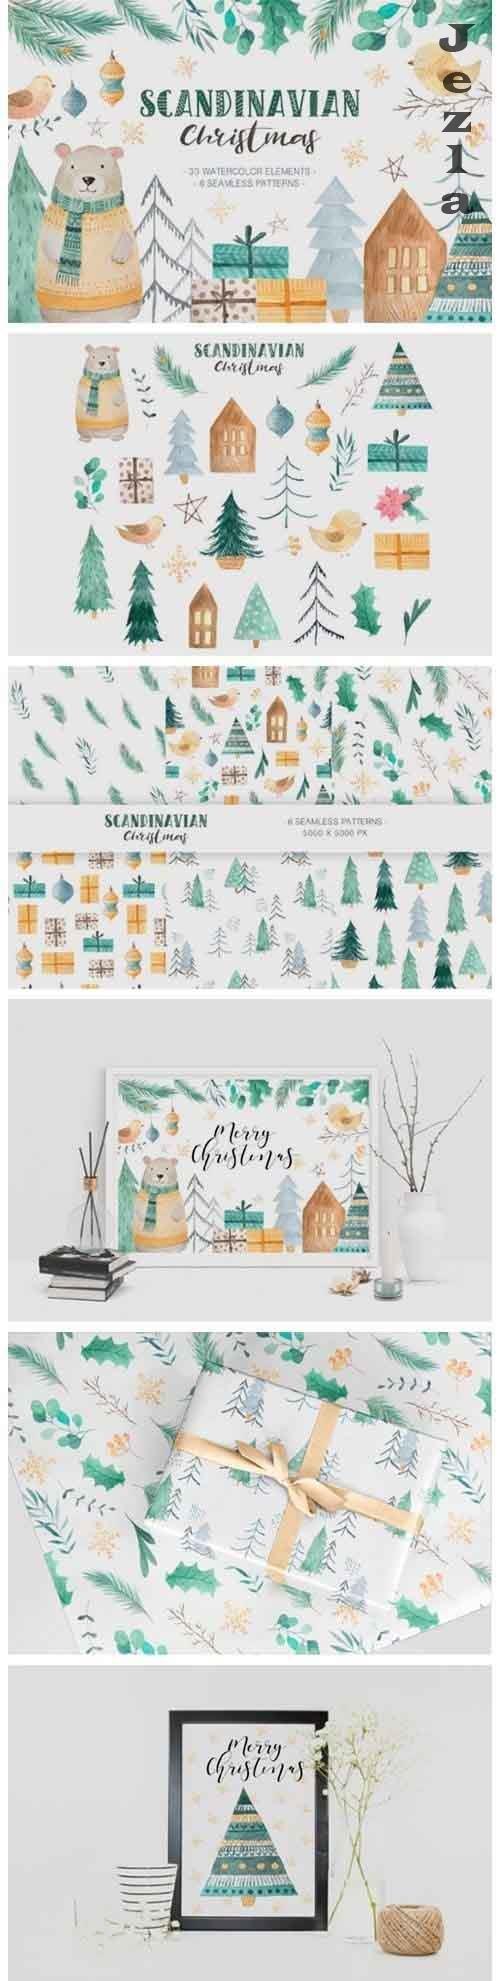 Scandinavian Watercolor Christmas - 2031626